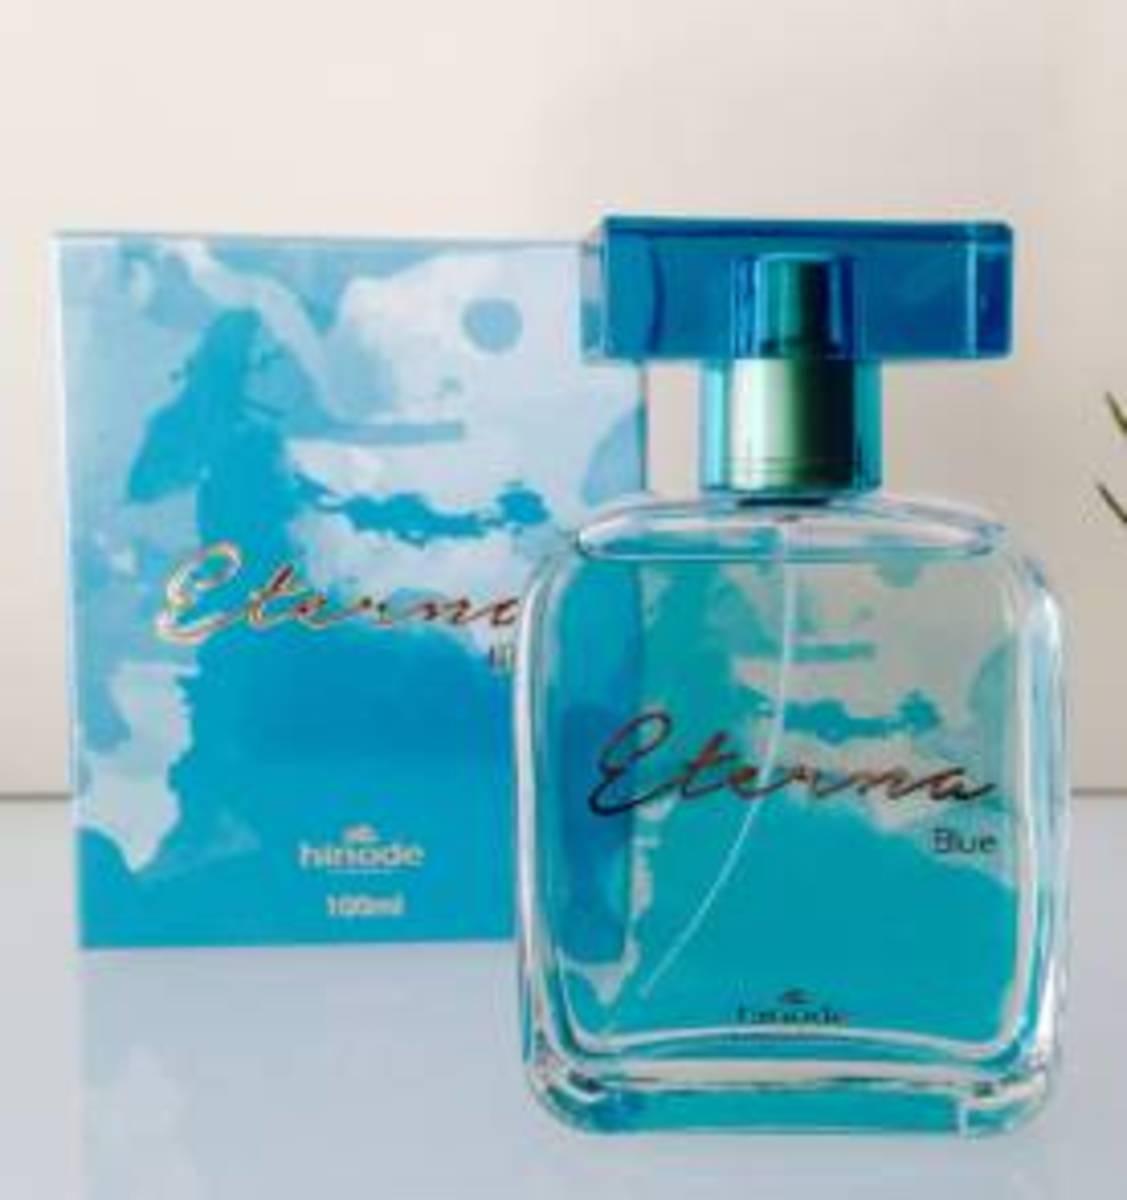 ETERNA BLUE HINODE